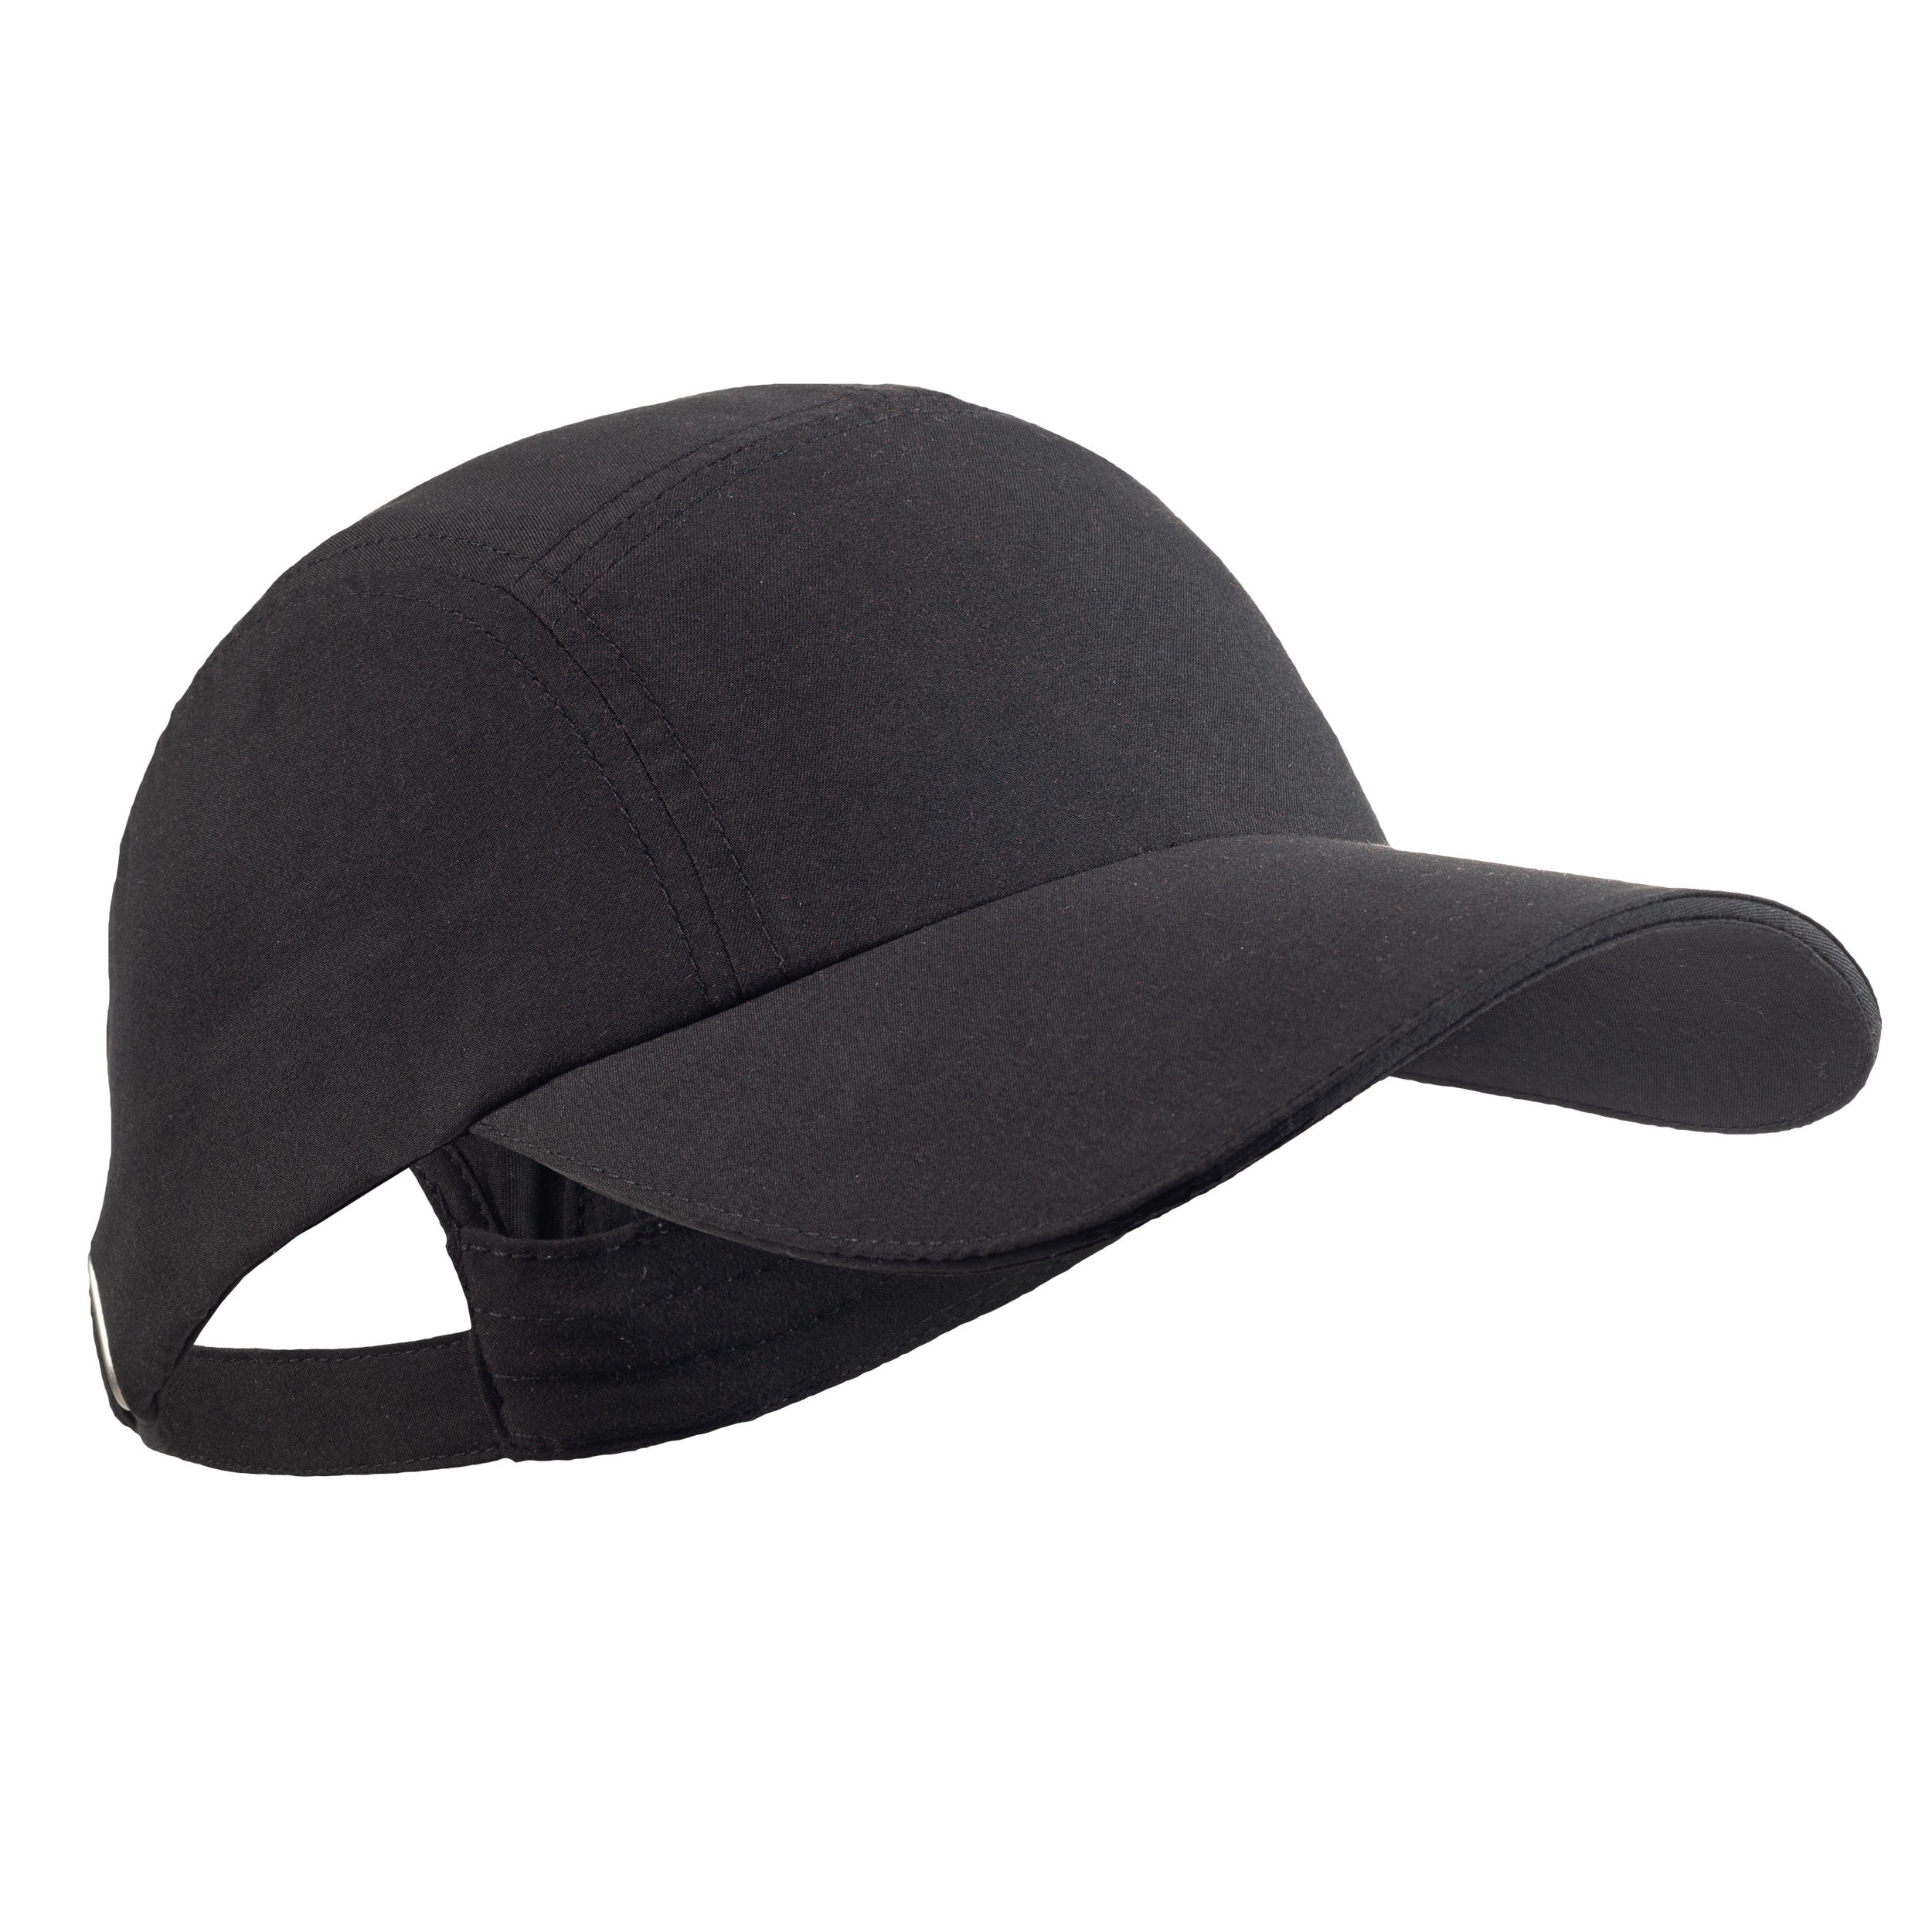 Şapcă fitness Nike negru imagine